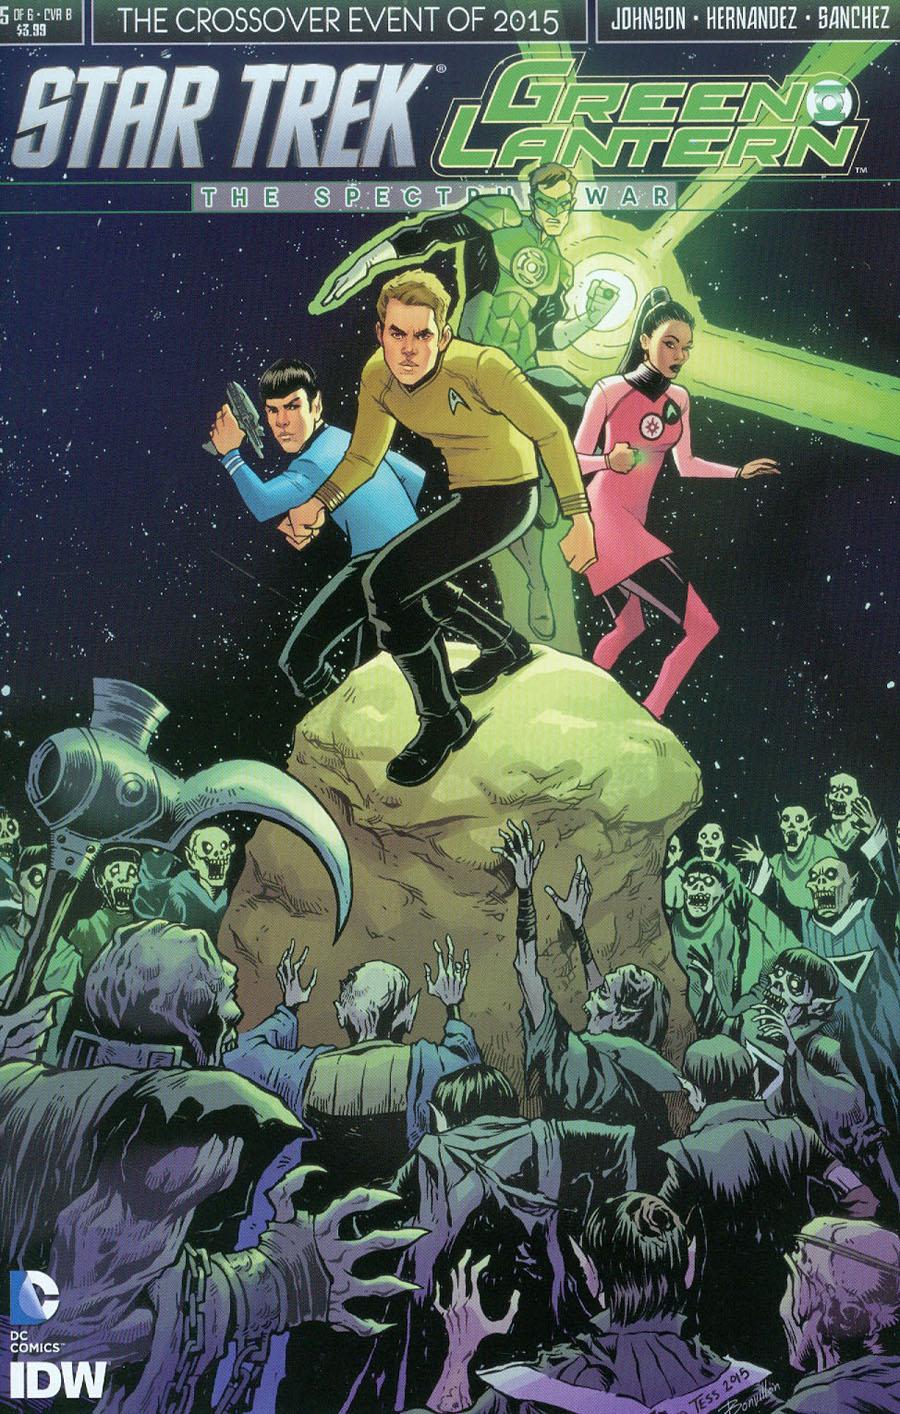 Star Trek Green Lantern #5 Cover B Variant Tess Fowler Subscription Cover